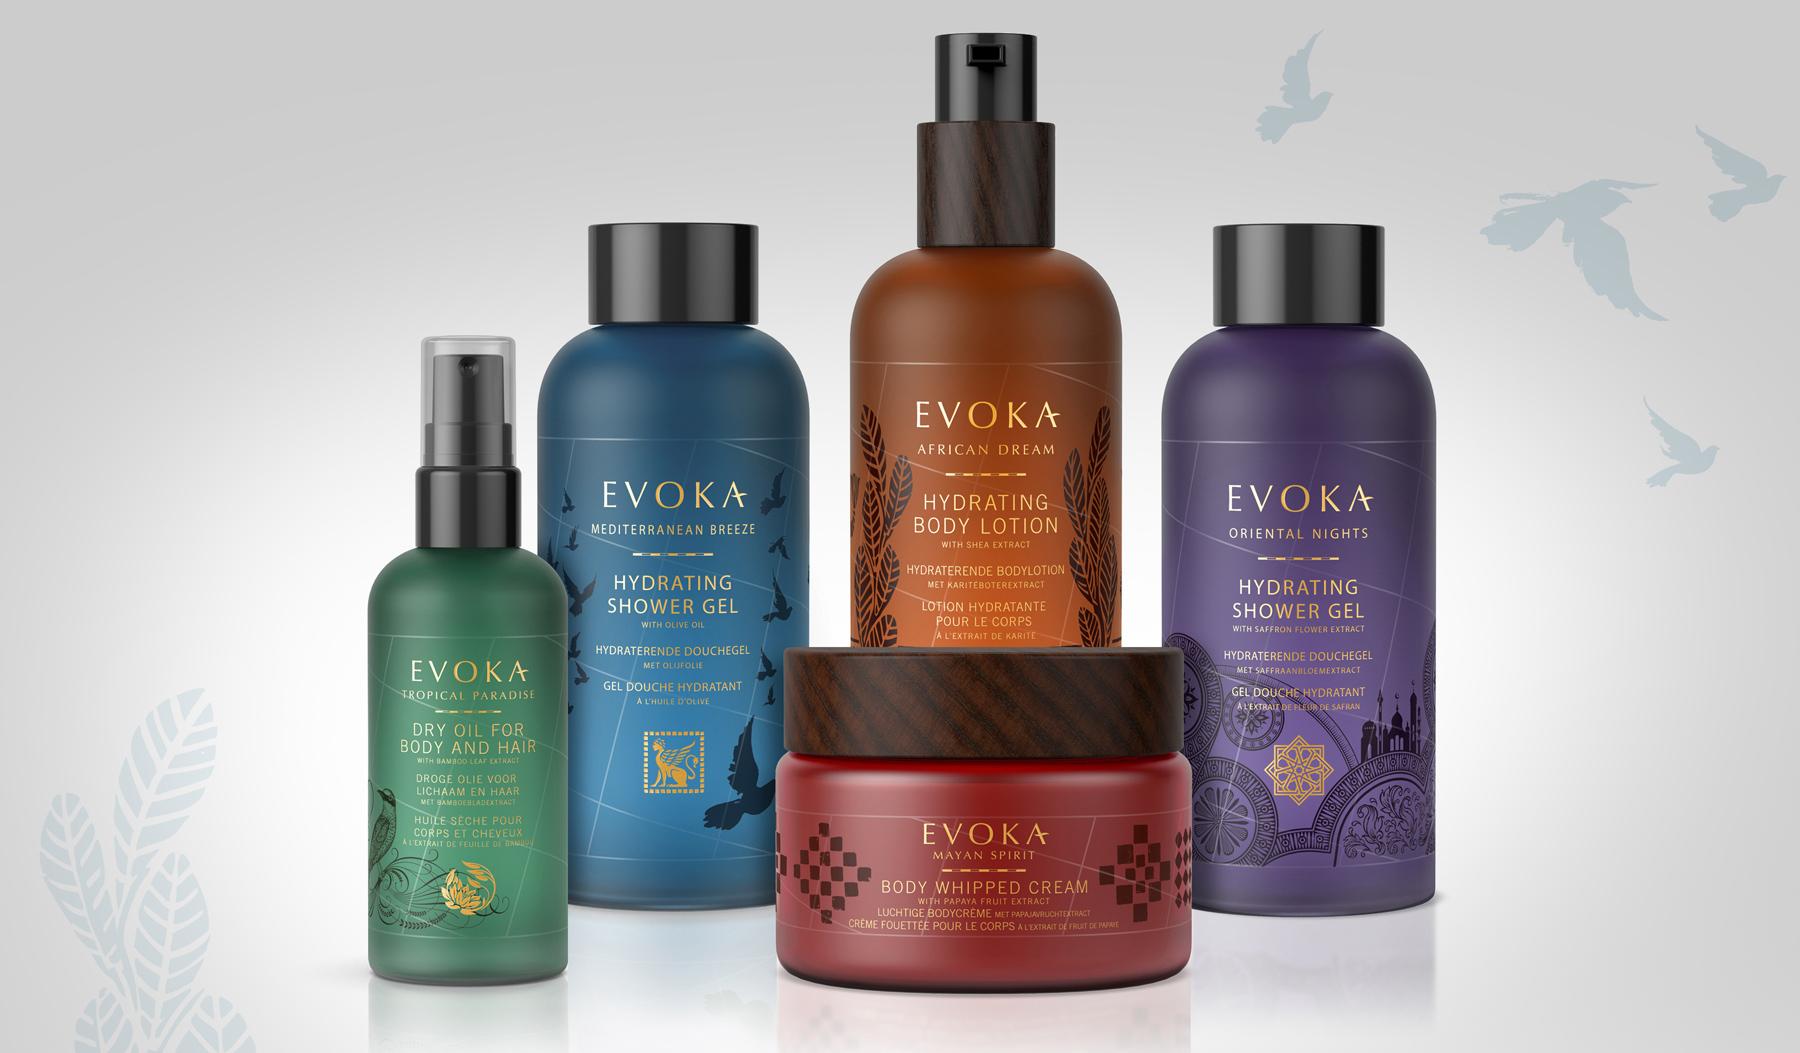 Evoka product range featuring branding by Biles Hendry